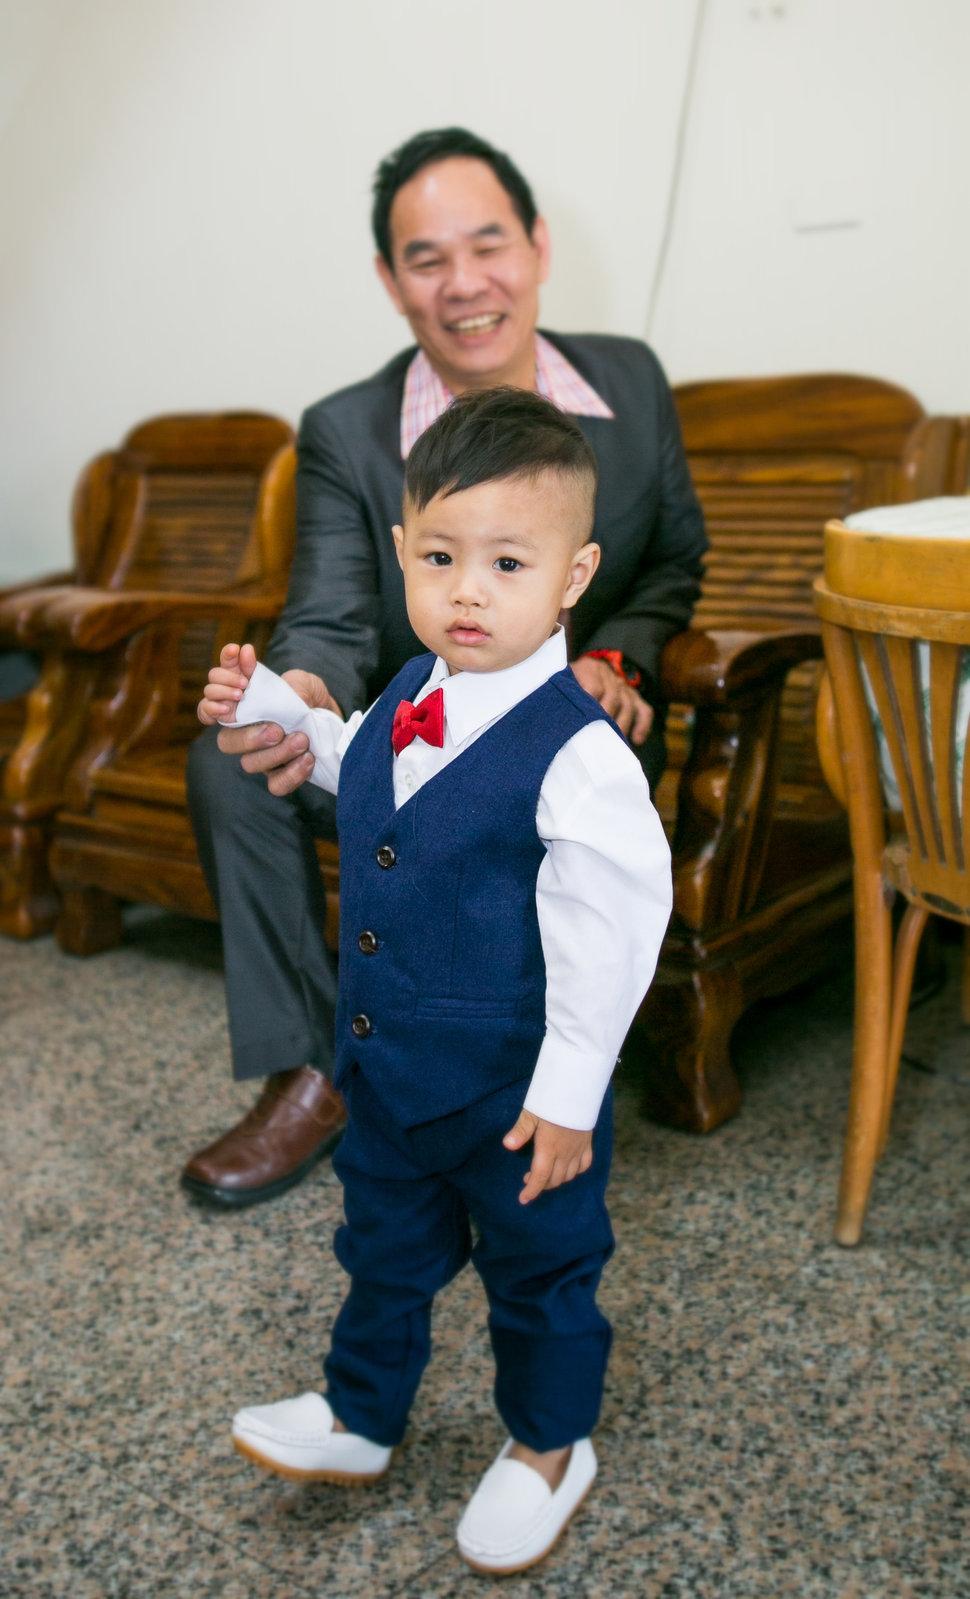 YF2A0824 - Yusin 攝影~與您同心祝福您永結同心 - 結婚吧